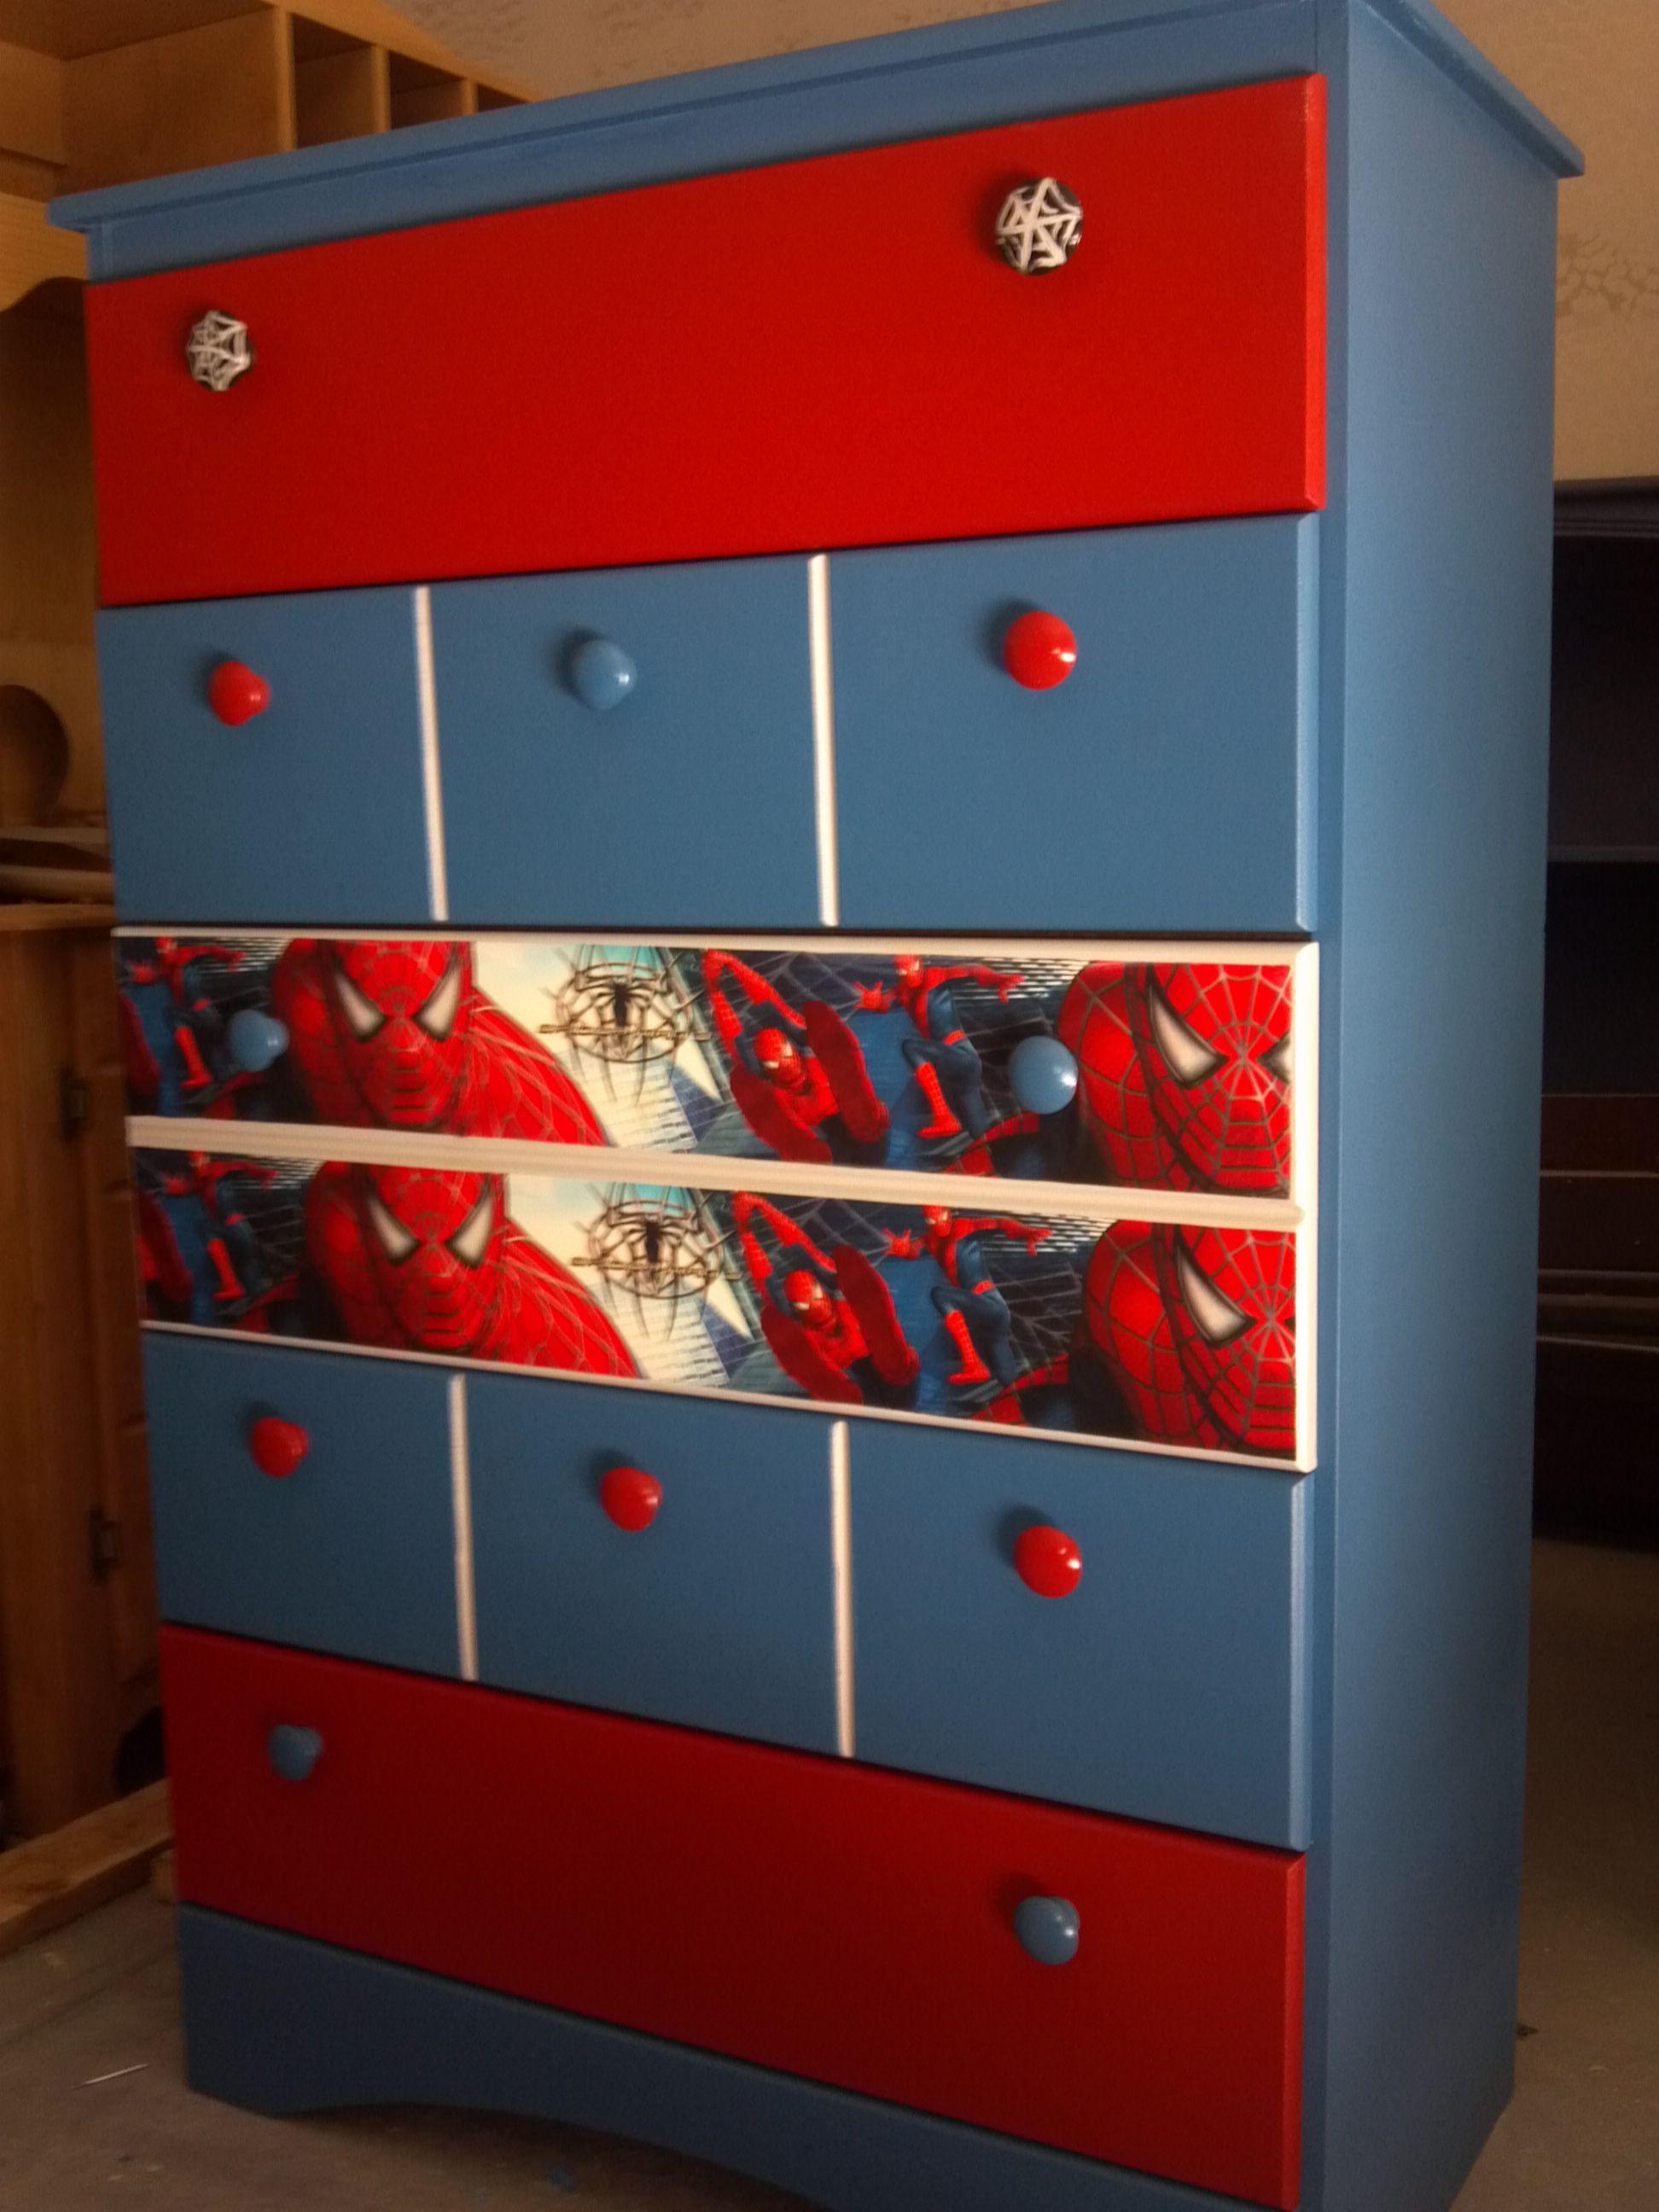 Spiderman dressers kids dressers kids bedroom kids - Dresser for small room ...